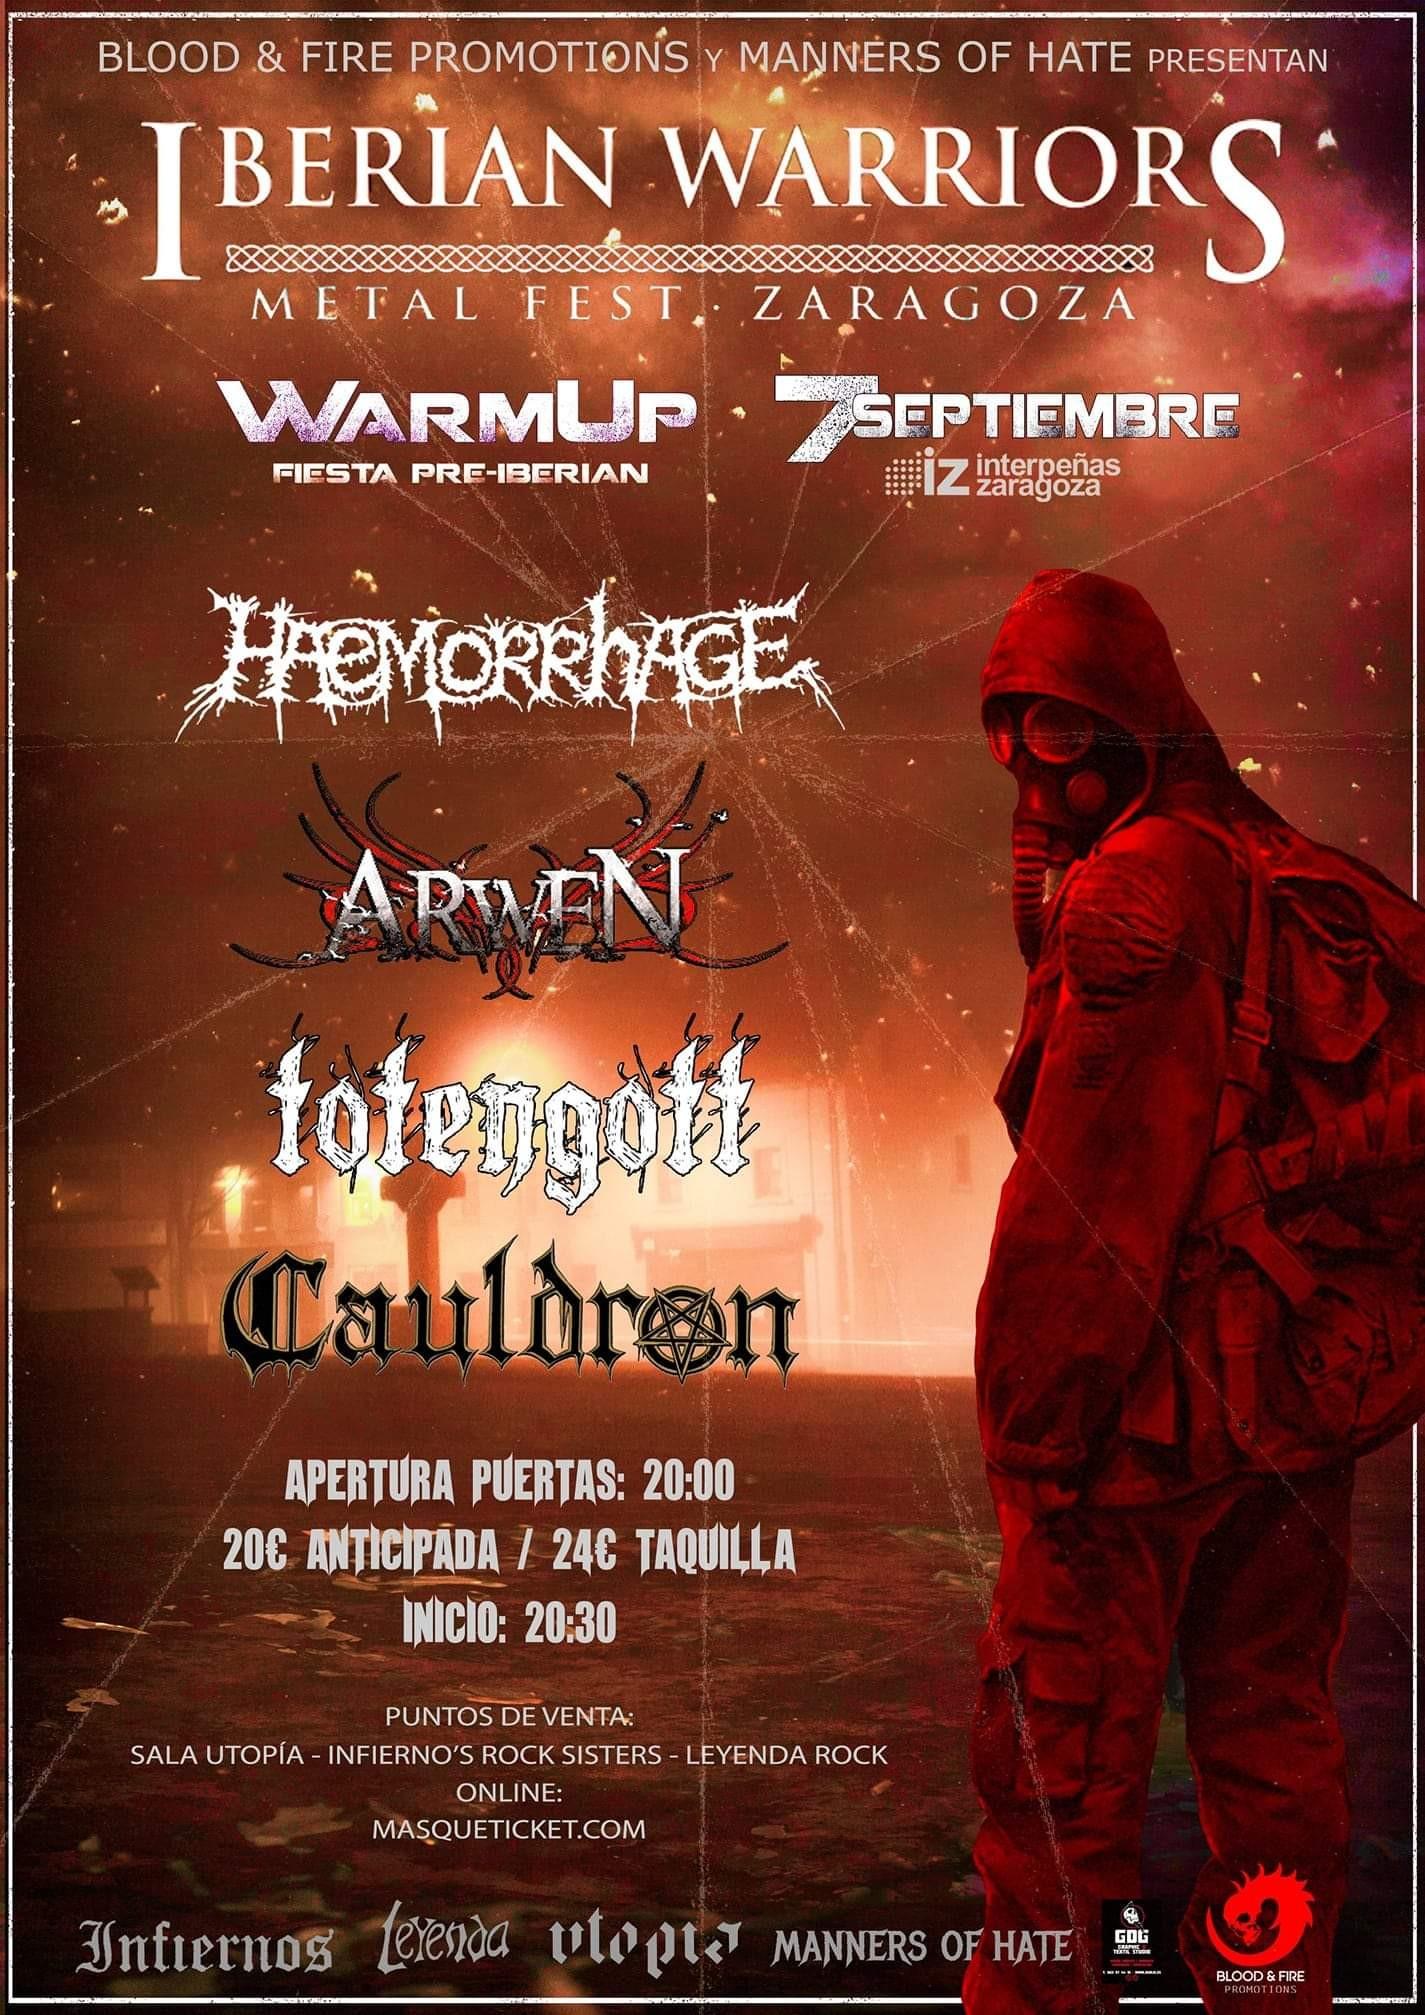 WARM UP IBERIAN FEST 2019: Haemorrhage, Kawir, Totengott, Arwen, Cauldron